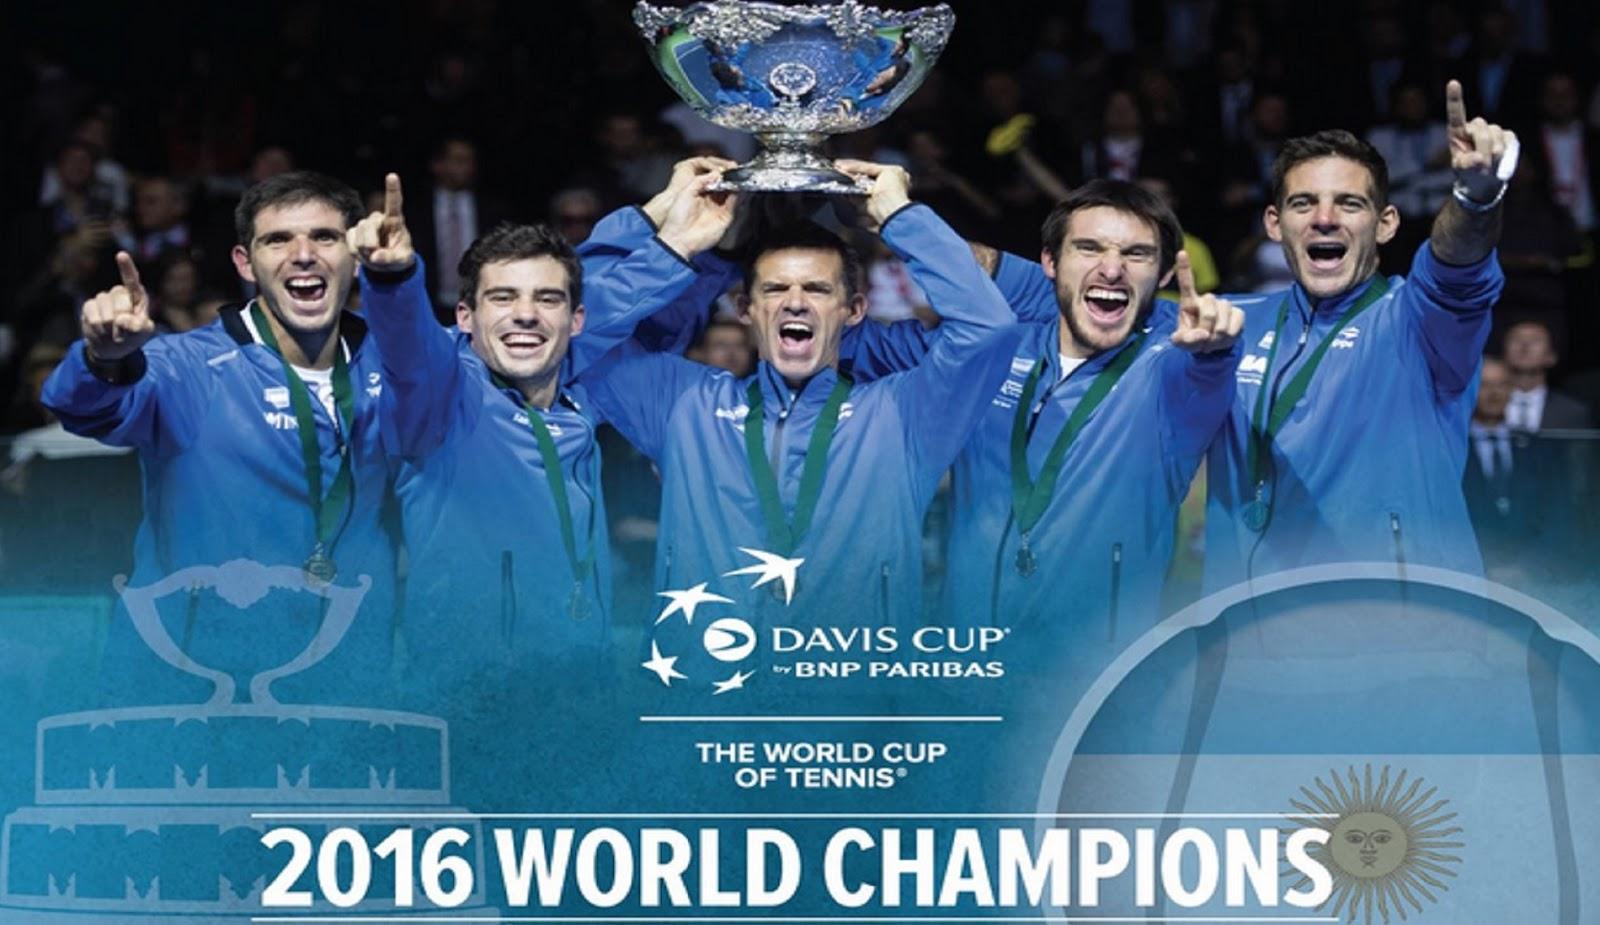 ARGENTINA DAVIS CUP CHAMPIONS 2